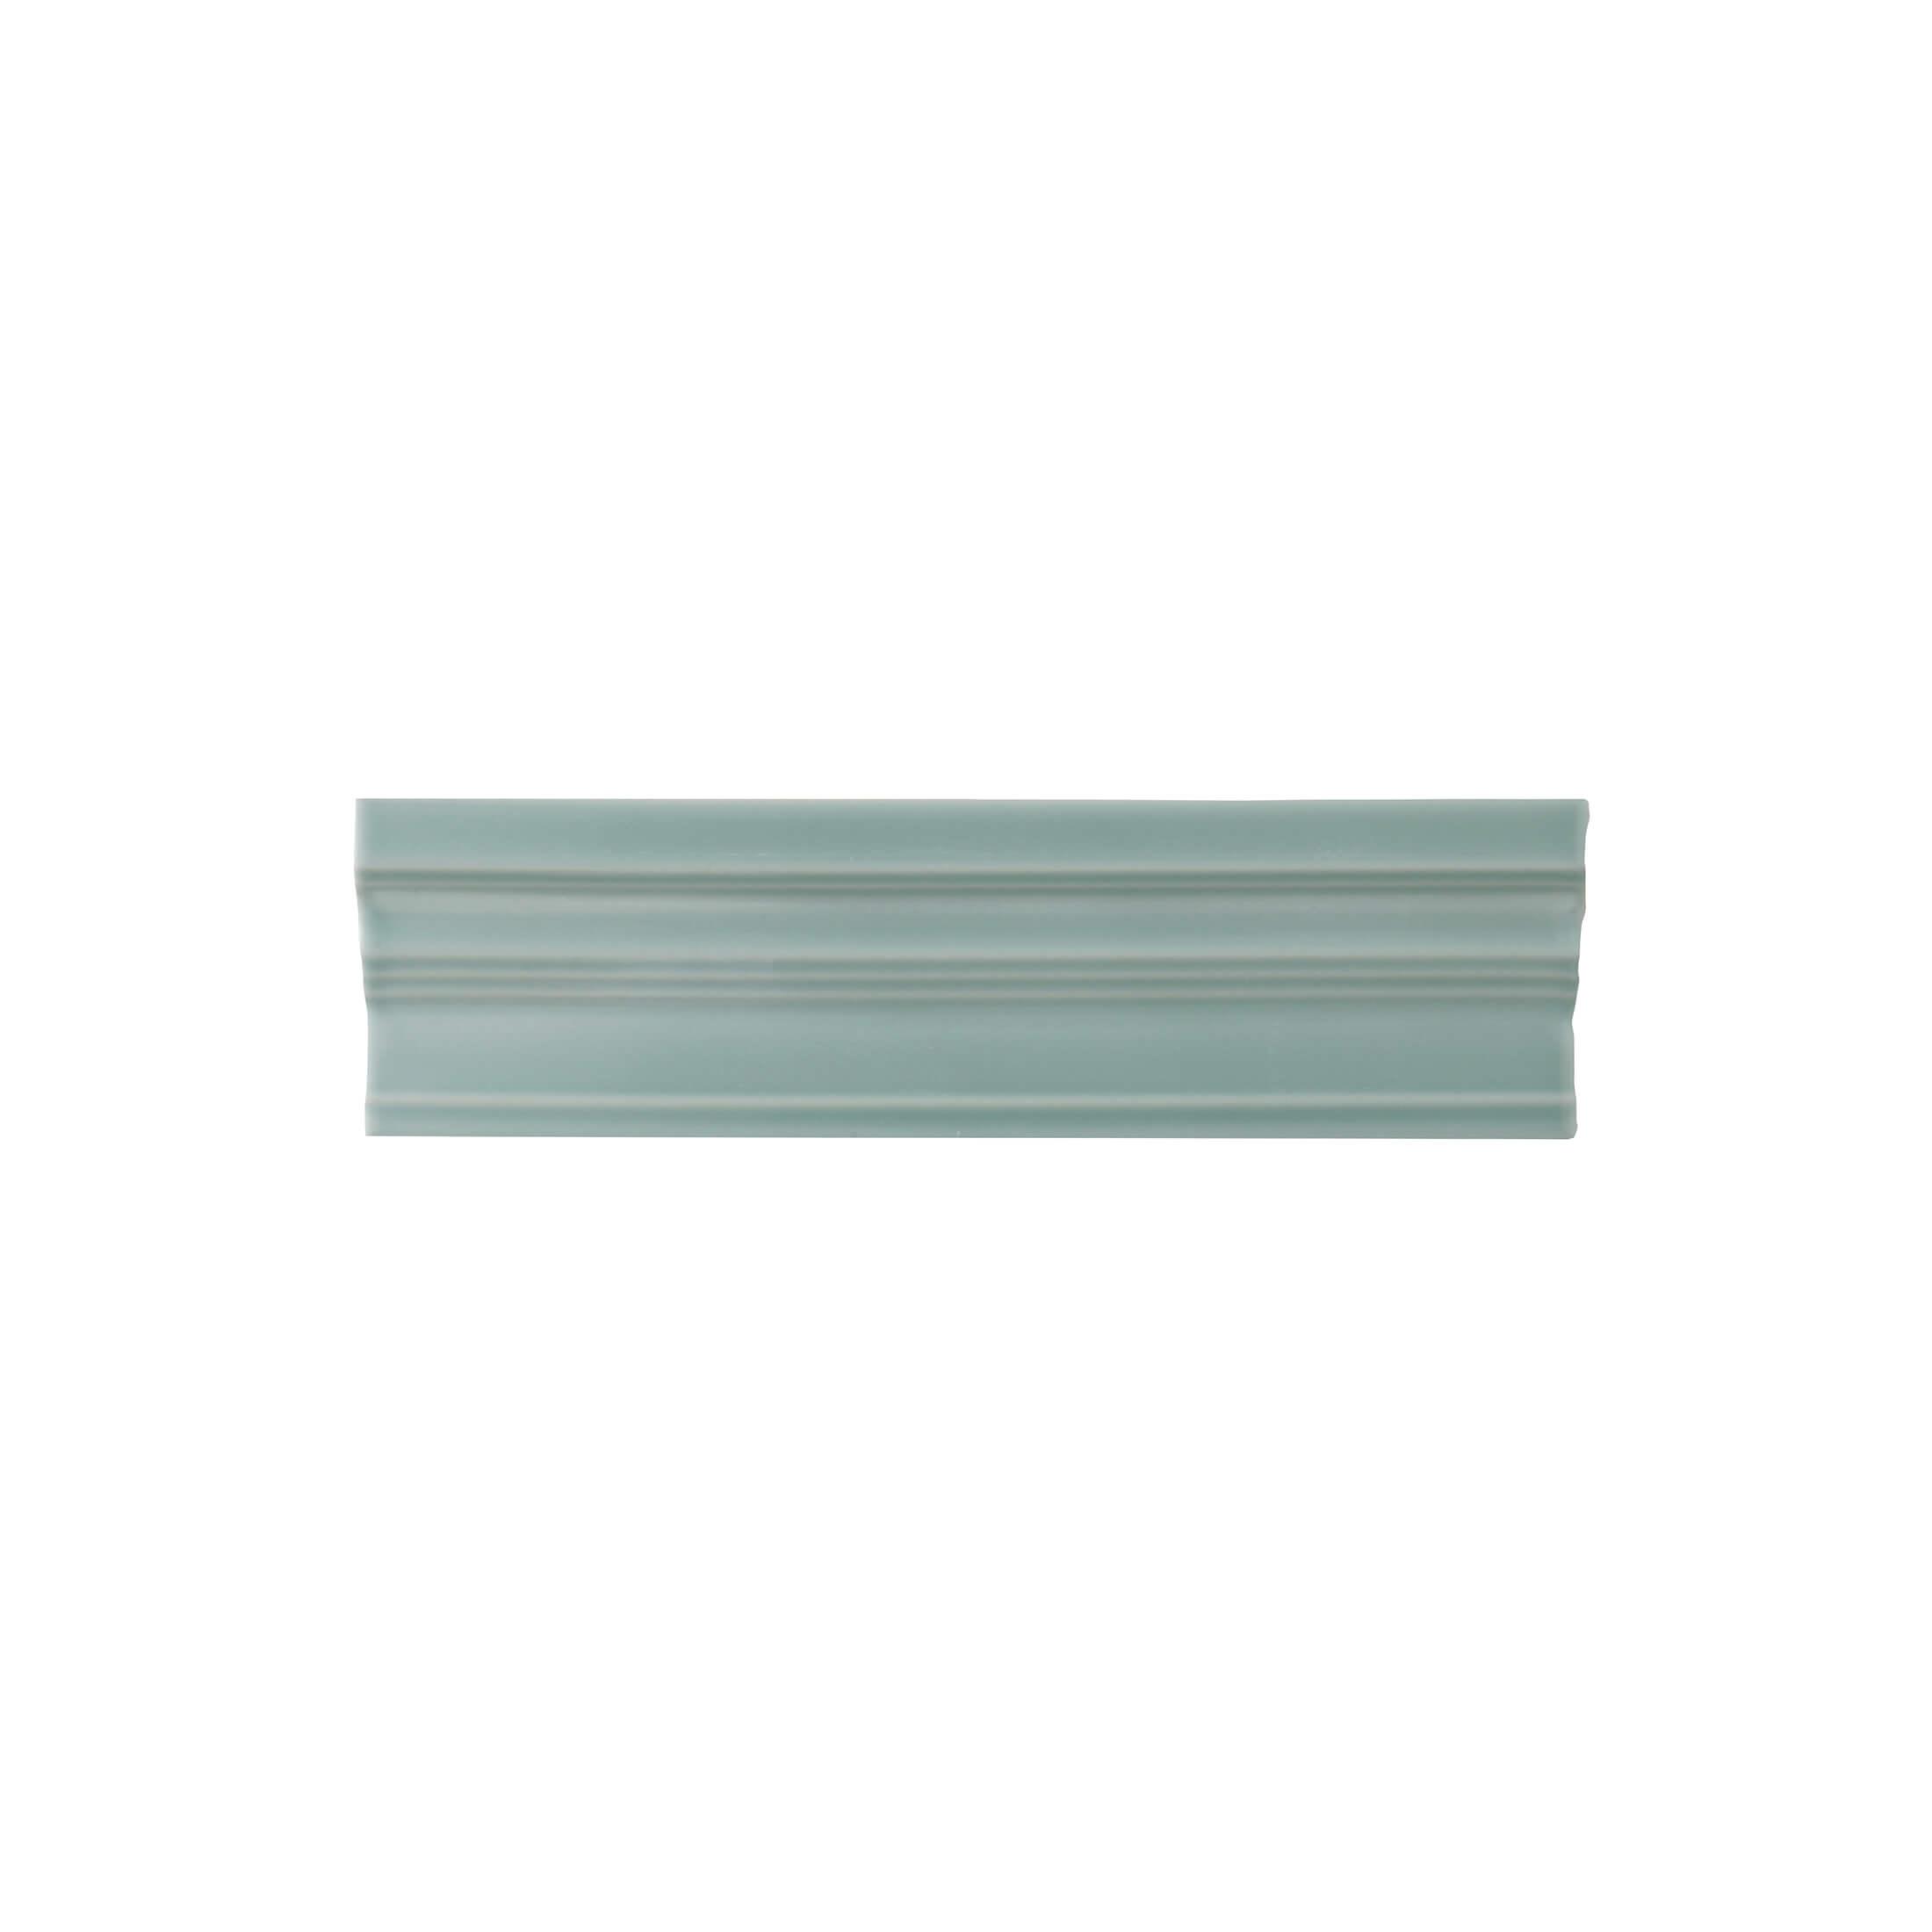 ADNE5614 - CORNISA CLASICA - 5 cm X 20 cm